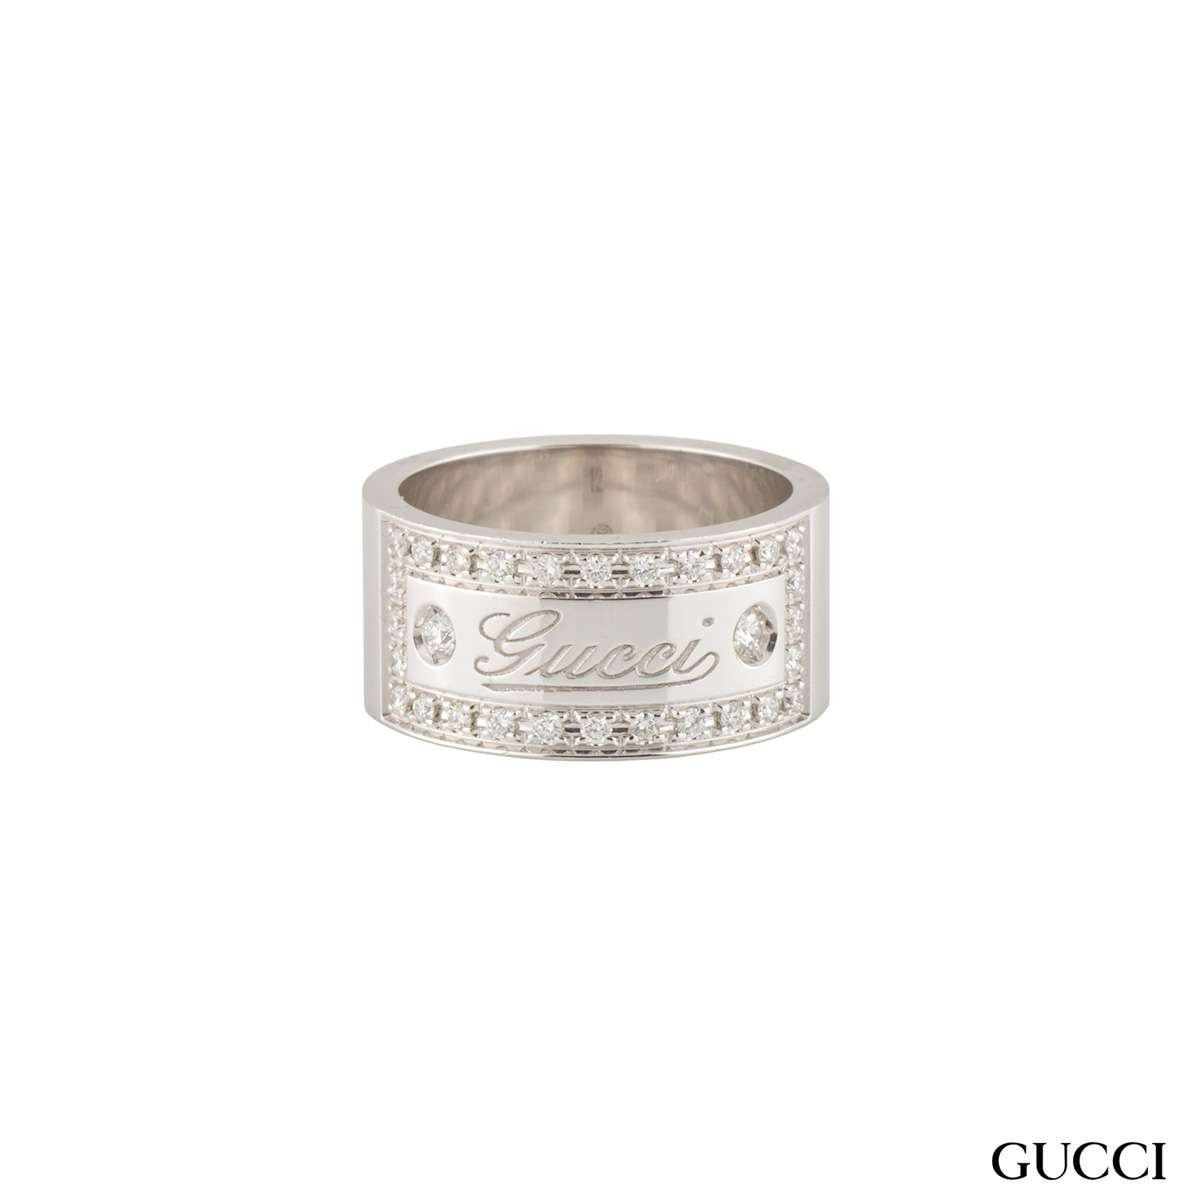 Gucci White Gold Diamond Band Ring